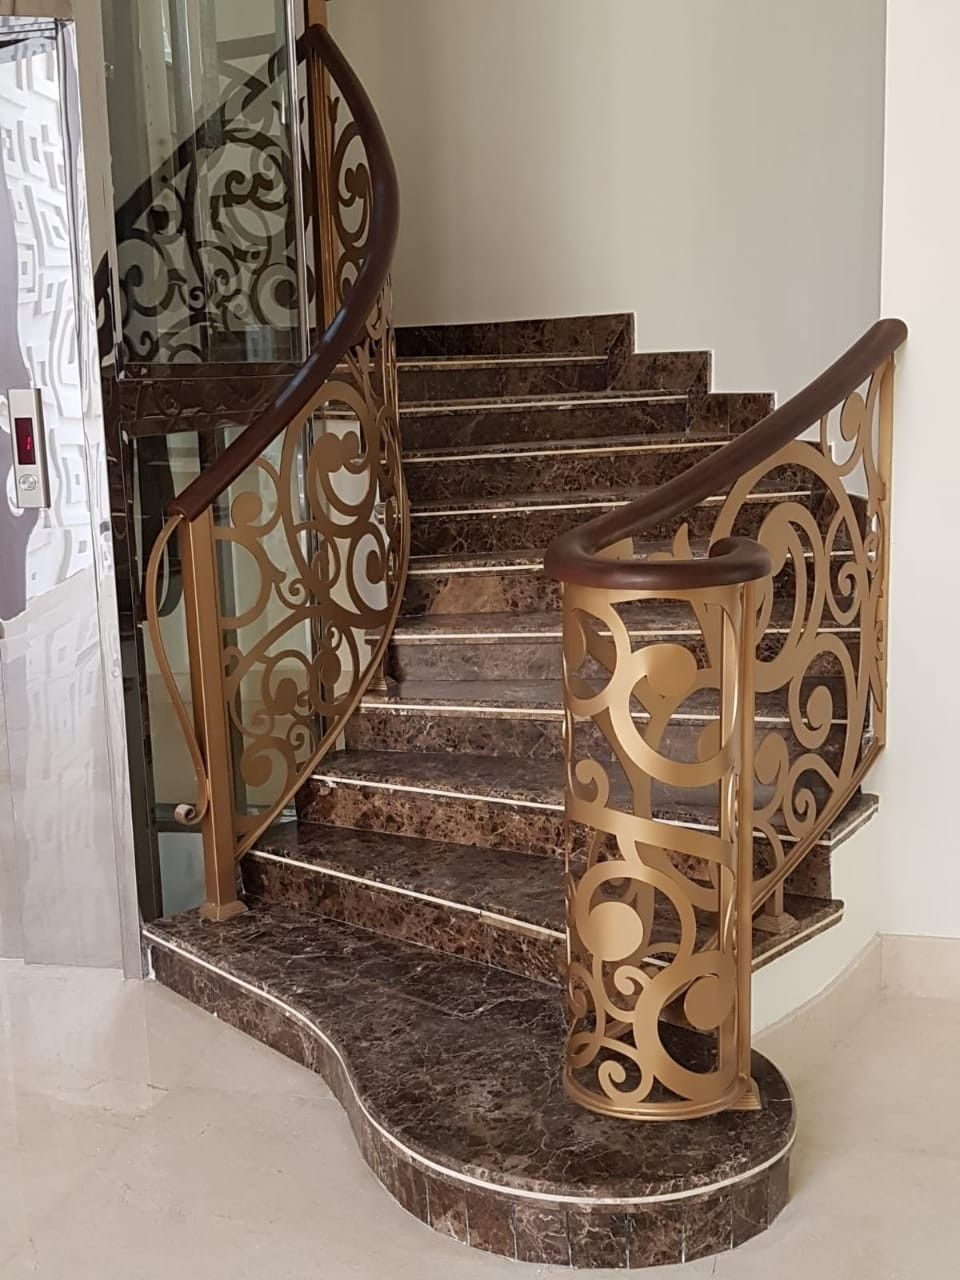 Saudiarabia Riyadh Doors Gates Design Cnc Lifestyle Modern Cadd Beautiful Metaldoo Unique House Design Staircase Railing Design Stair Railing Design